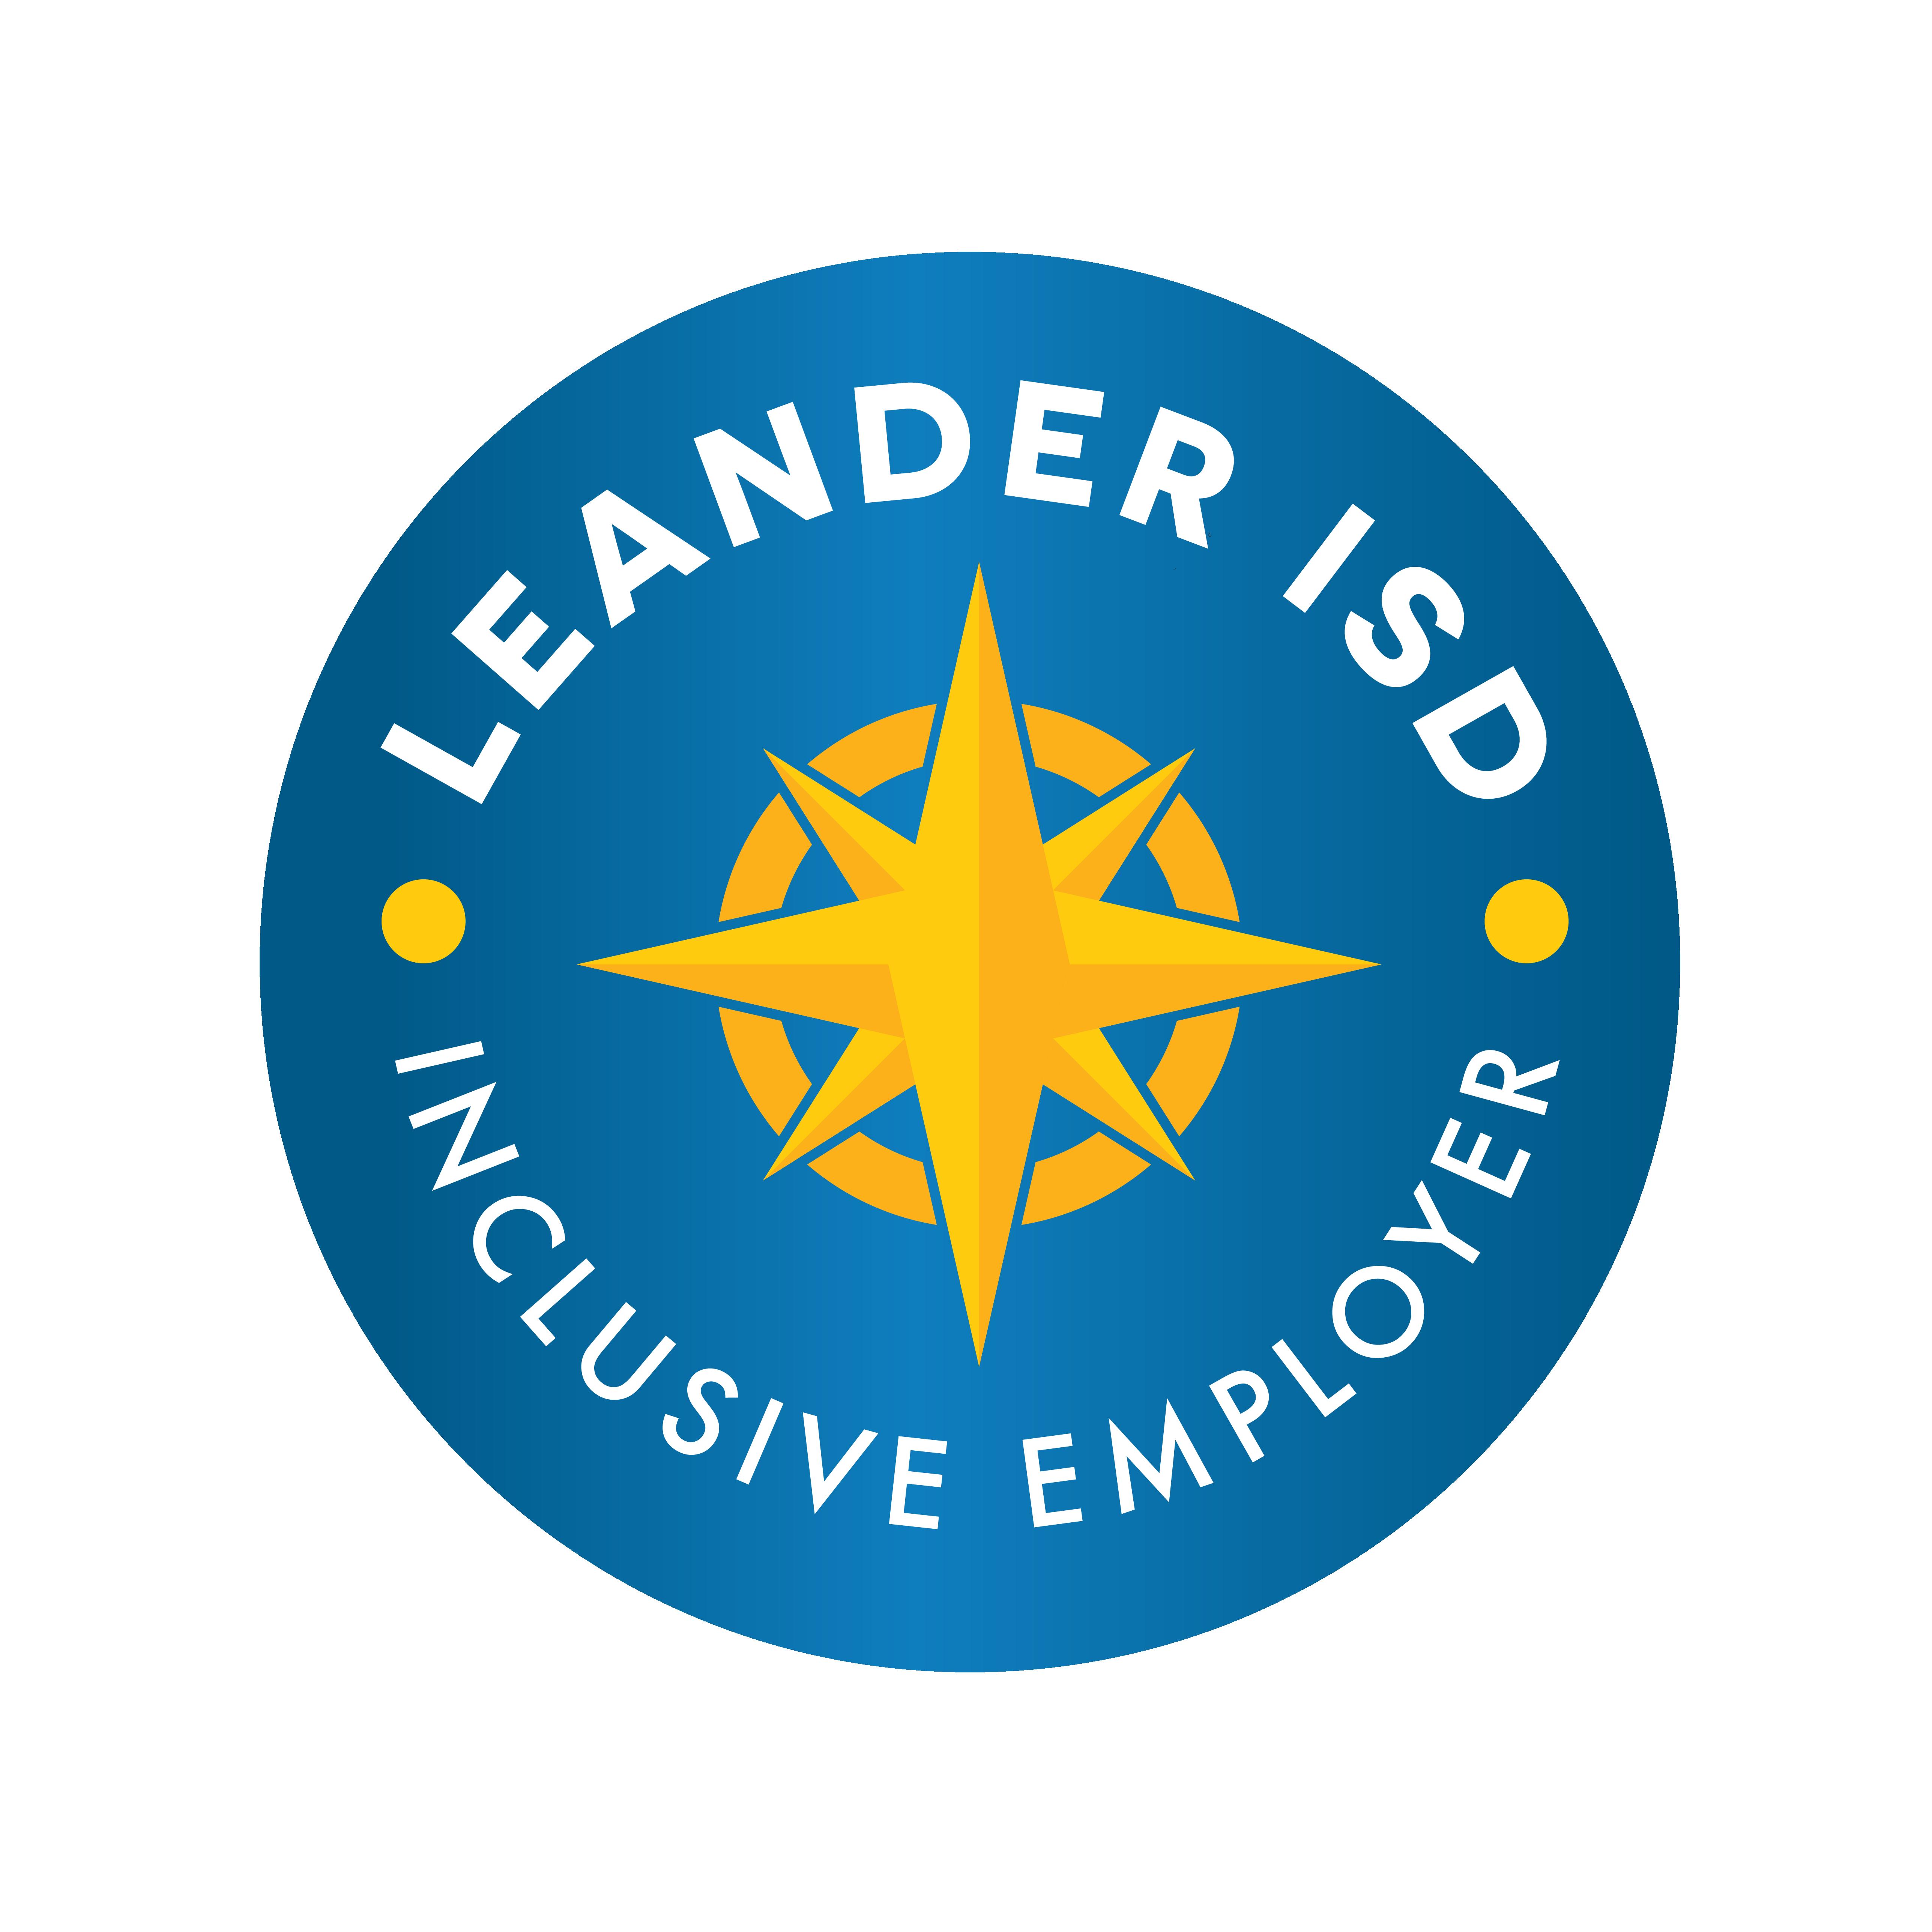 LISD Inclusive Employer